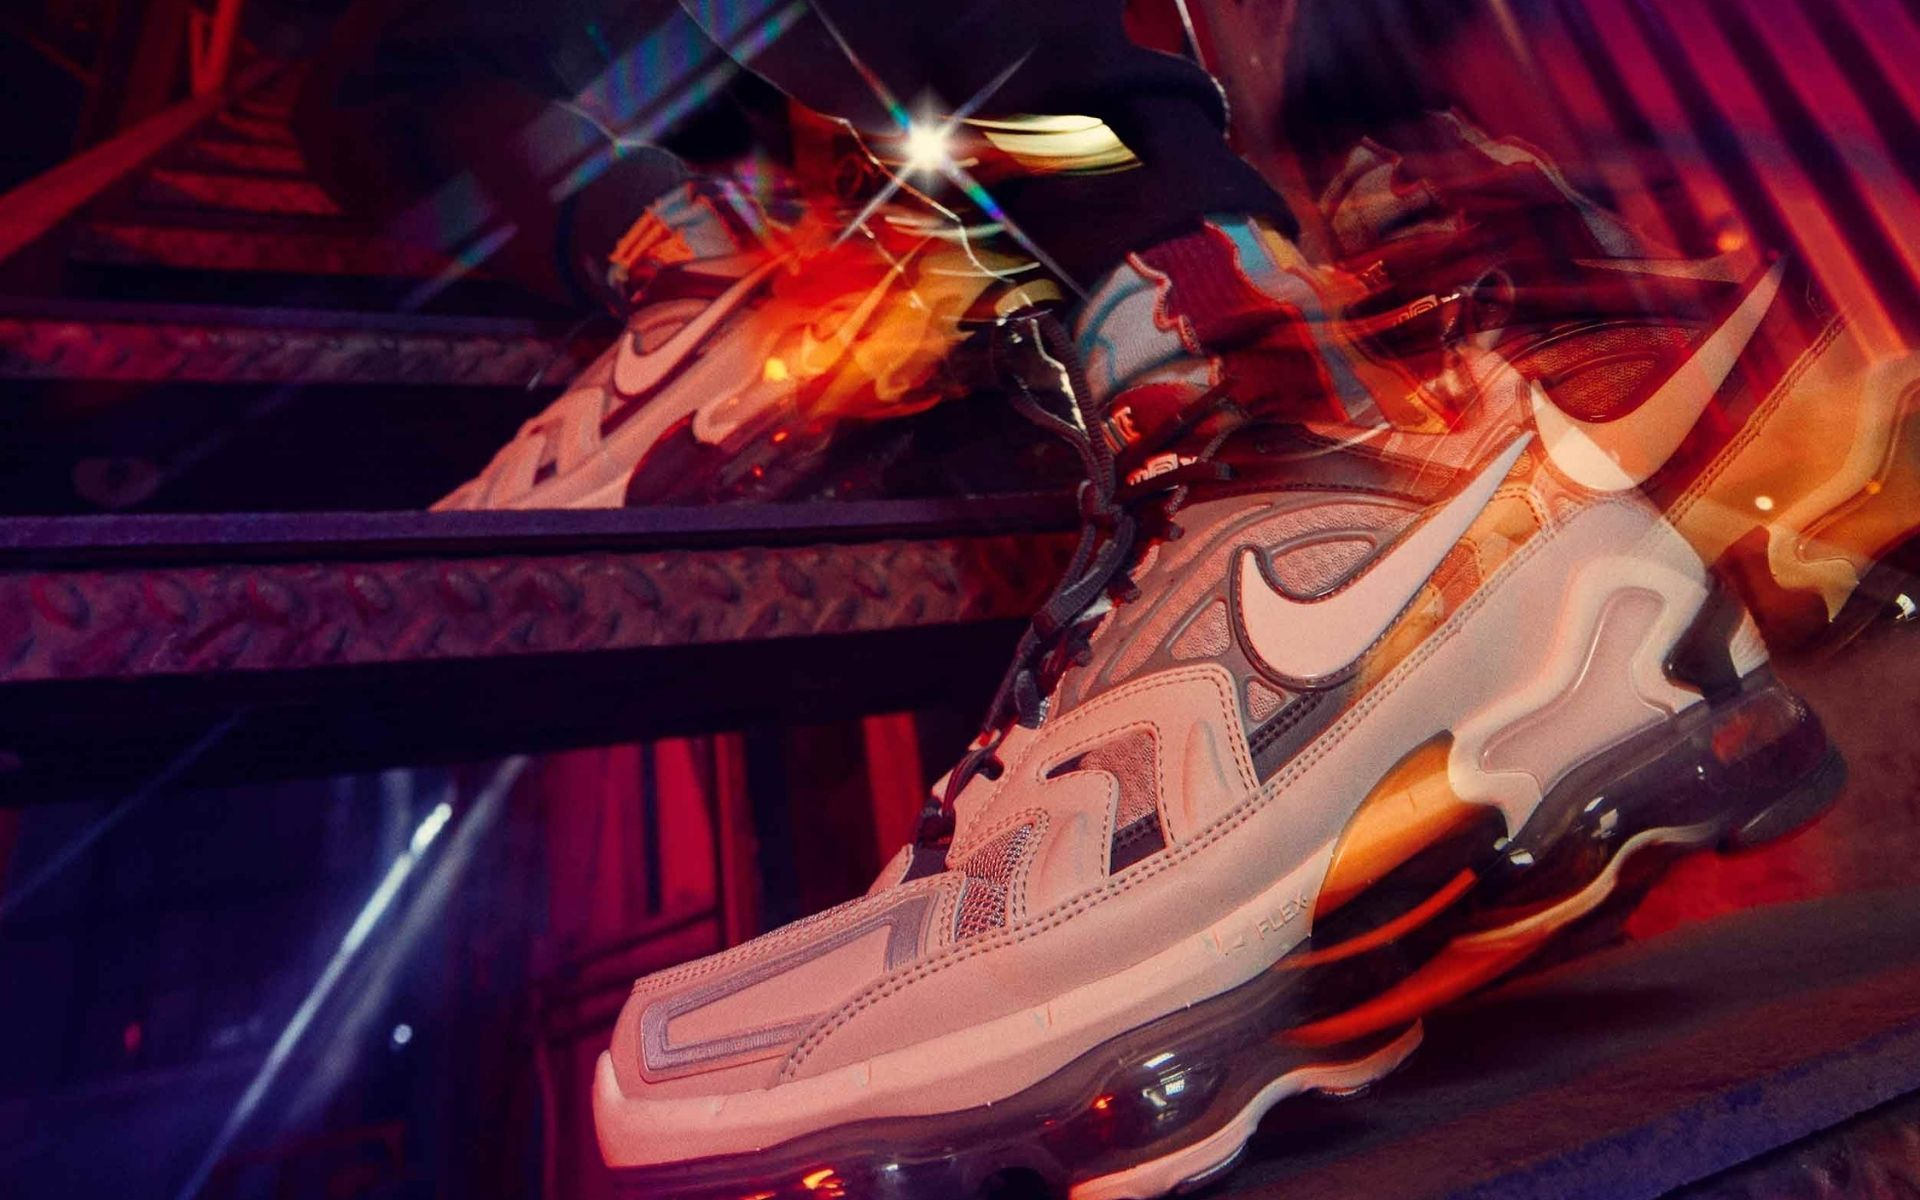 Nike Air Max Day 2021: 3 Sneakers We Love